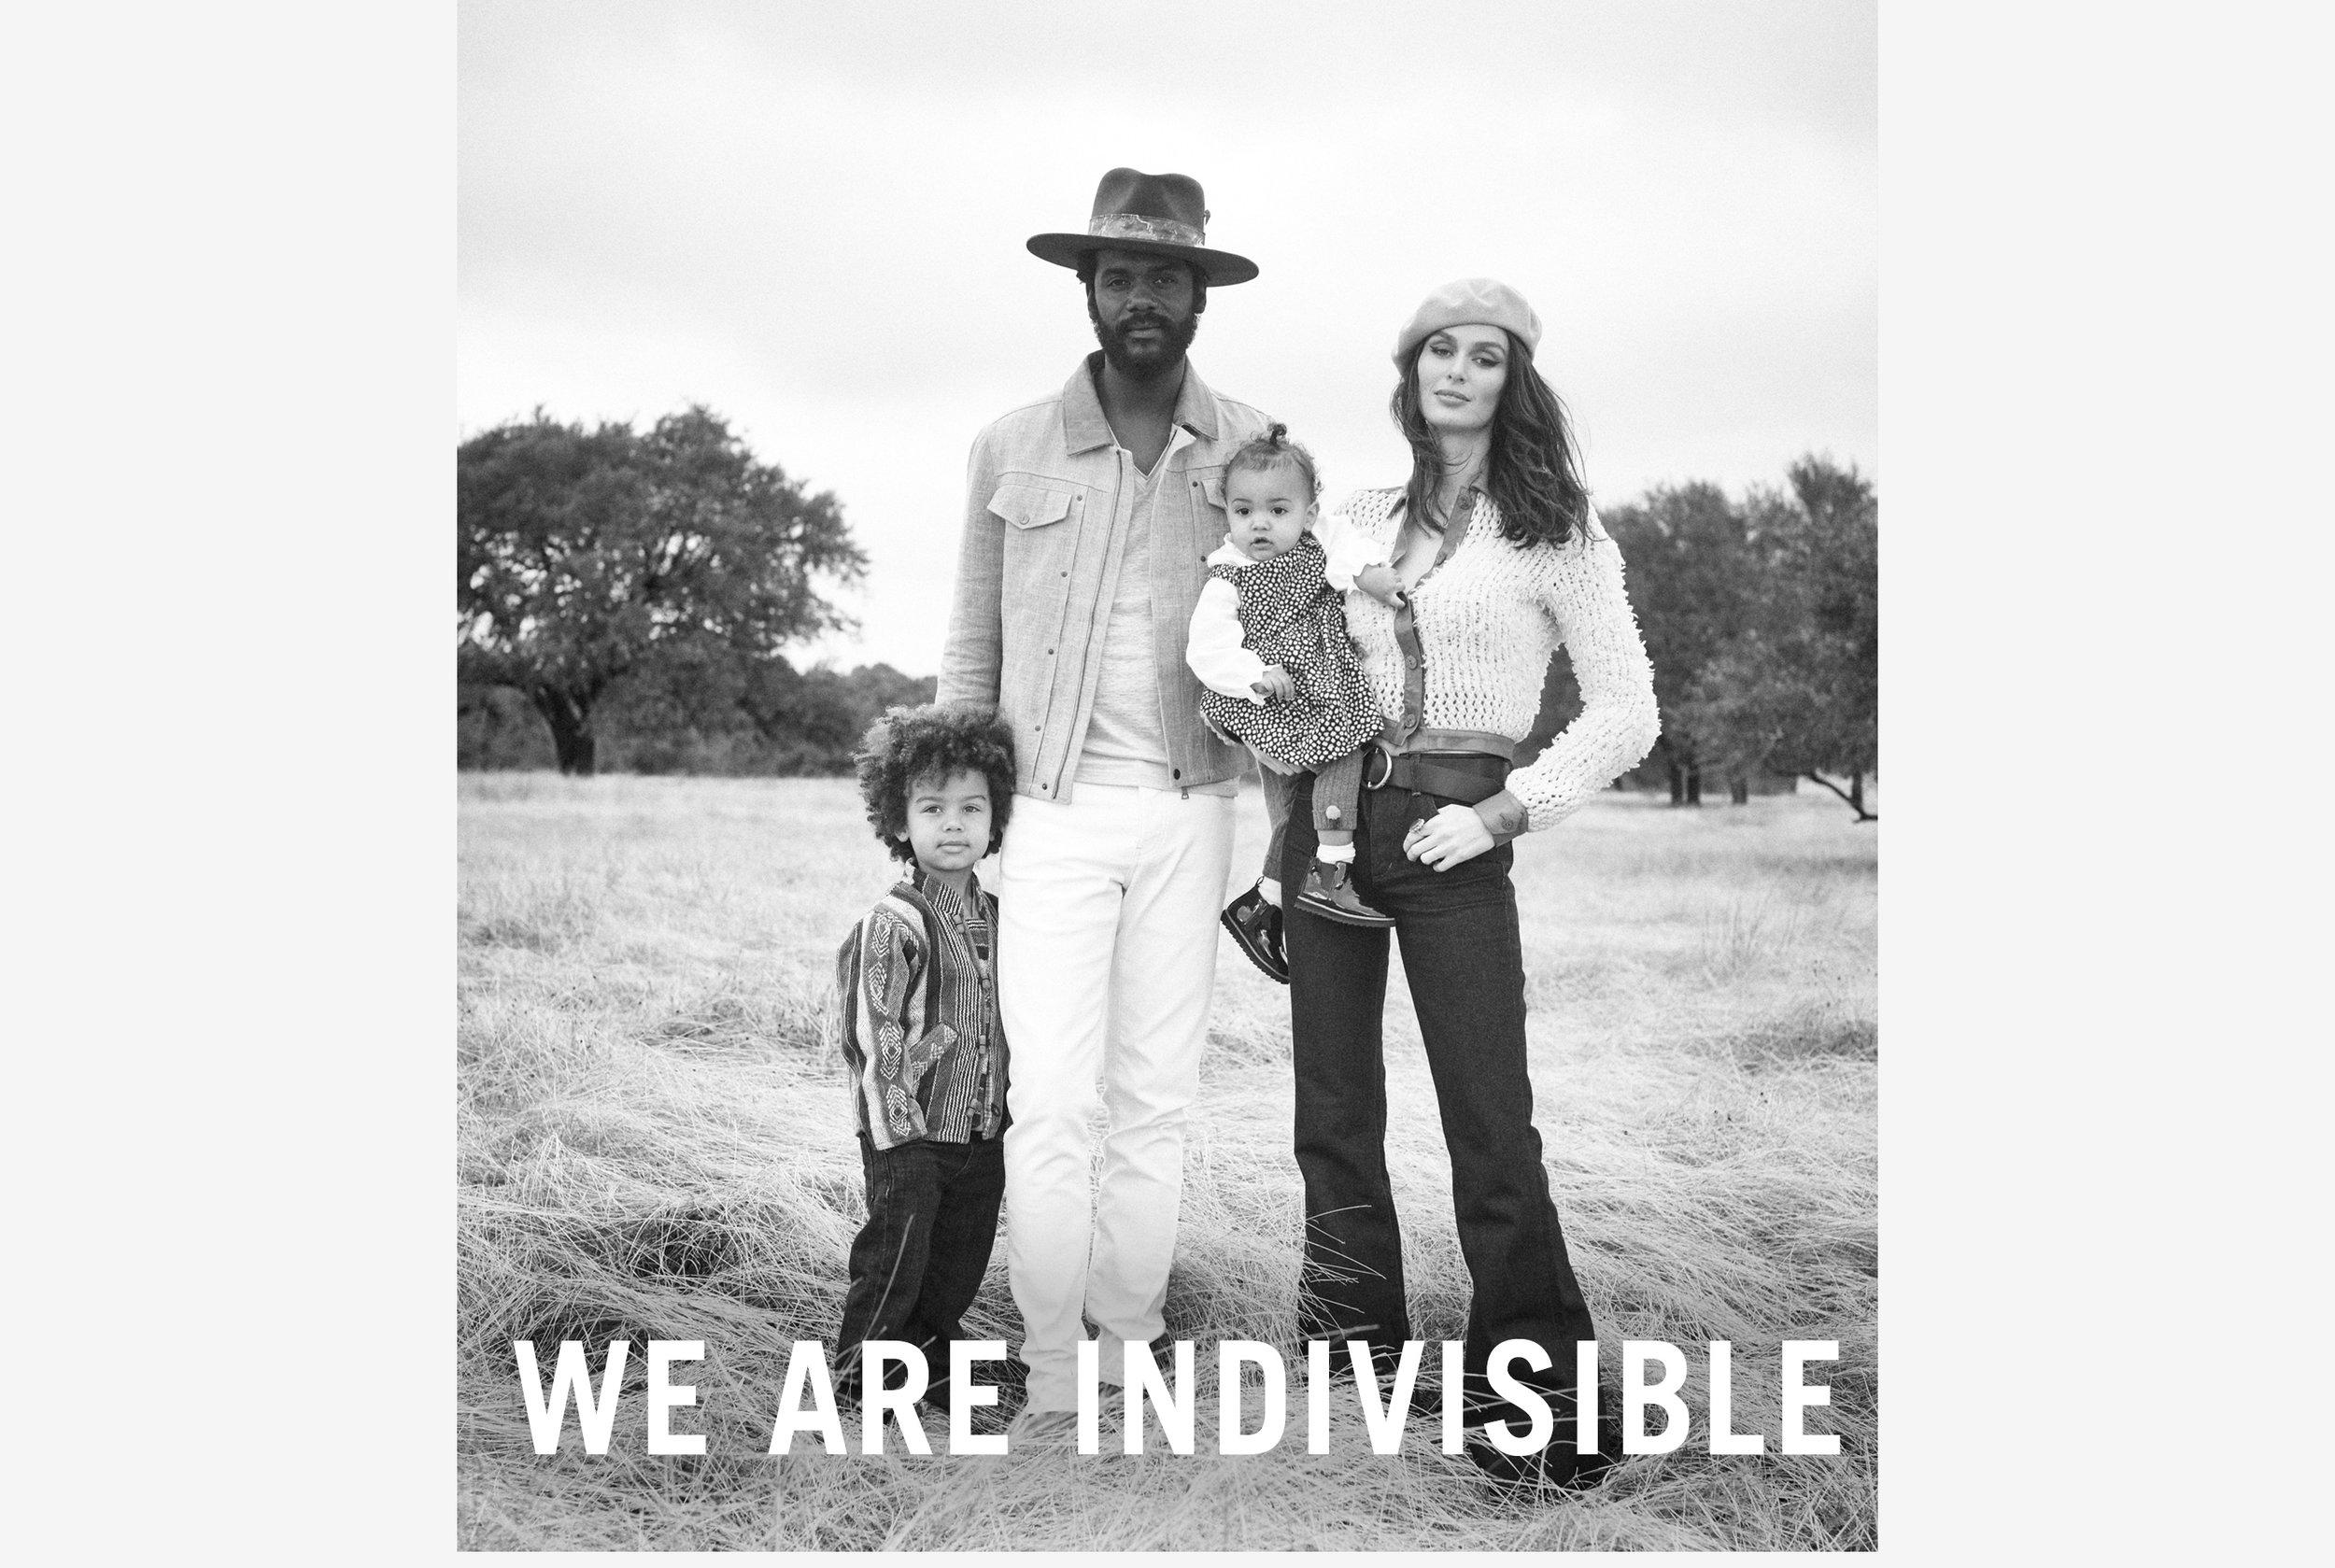 Nicole Trunfio Gary Clark Jr & Family - John Varvatos campaign